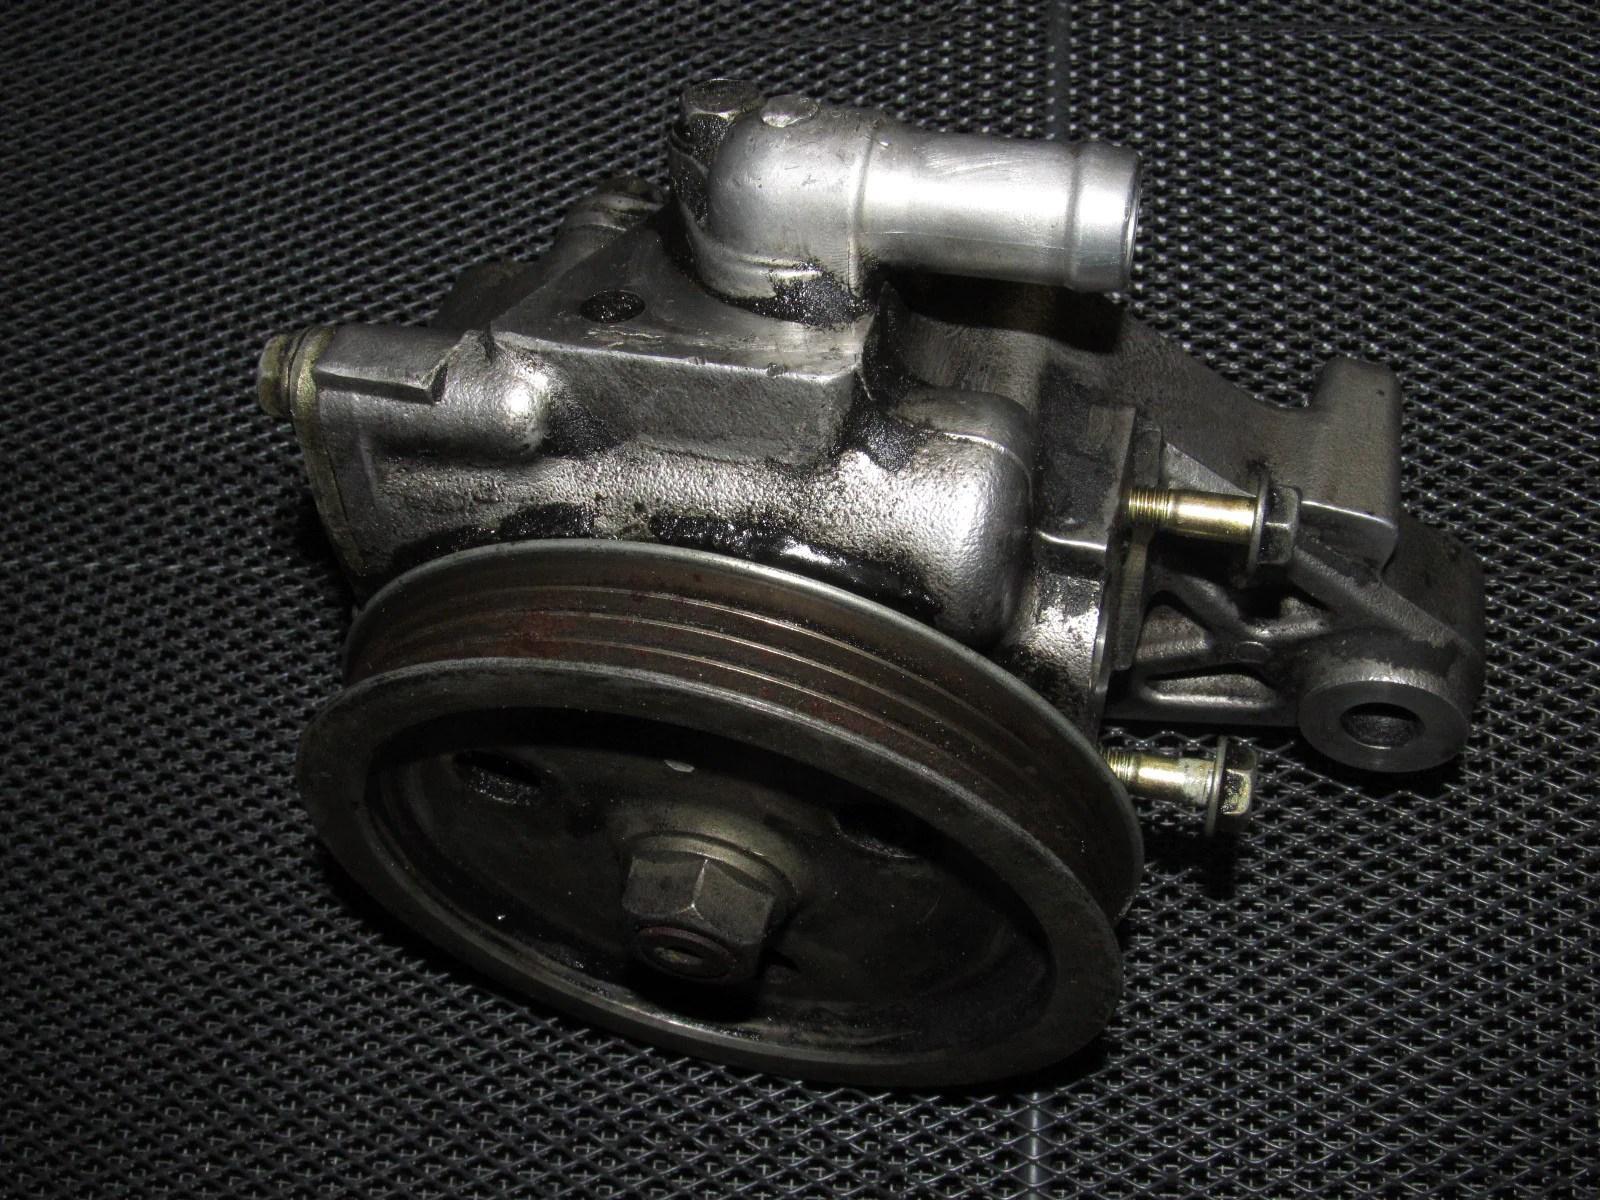 92 93 94 95 honda civic oem d15b7 power steering pump [ 1600 x 1200 Pixel ]